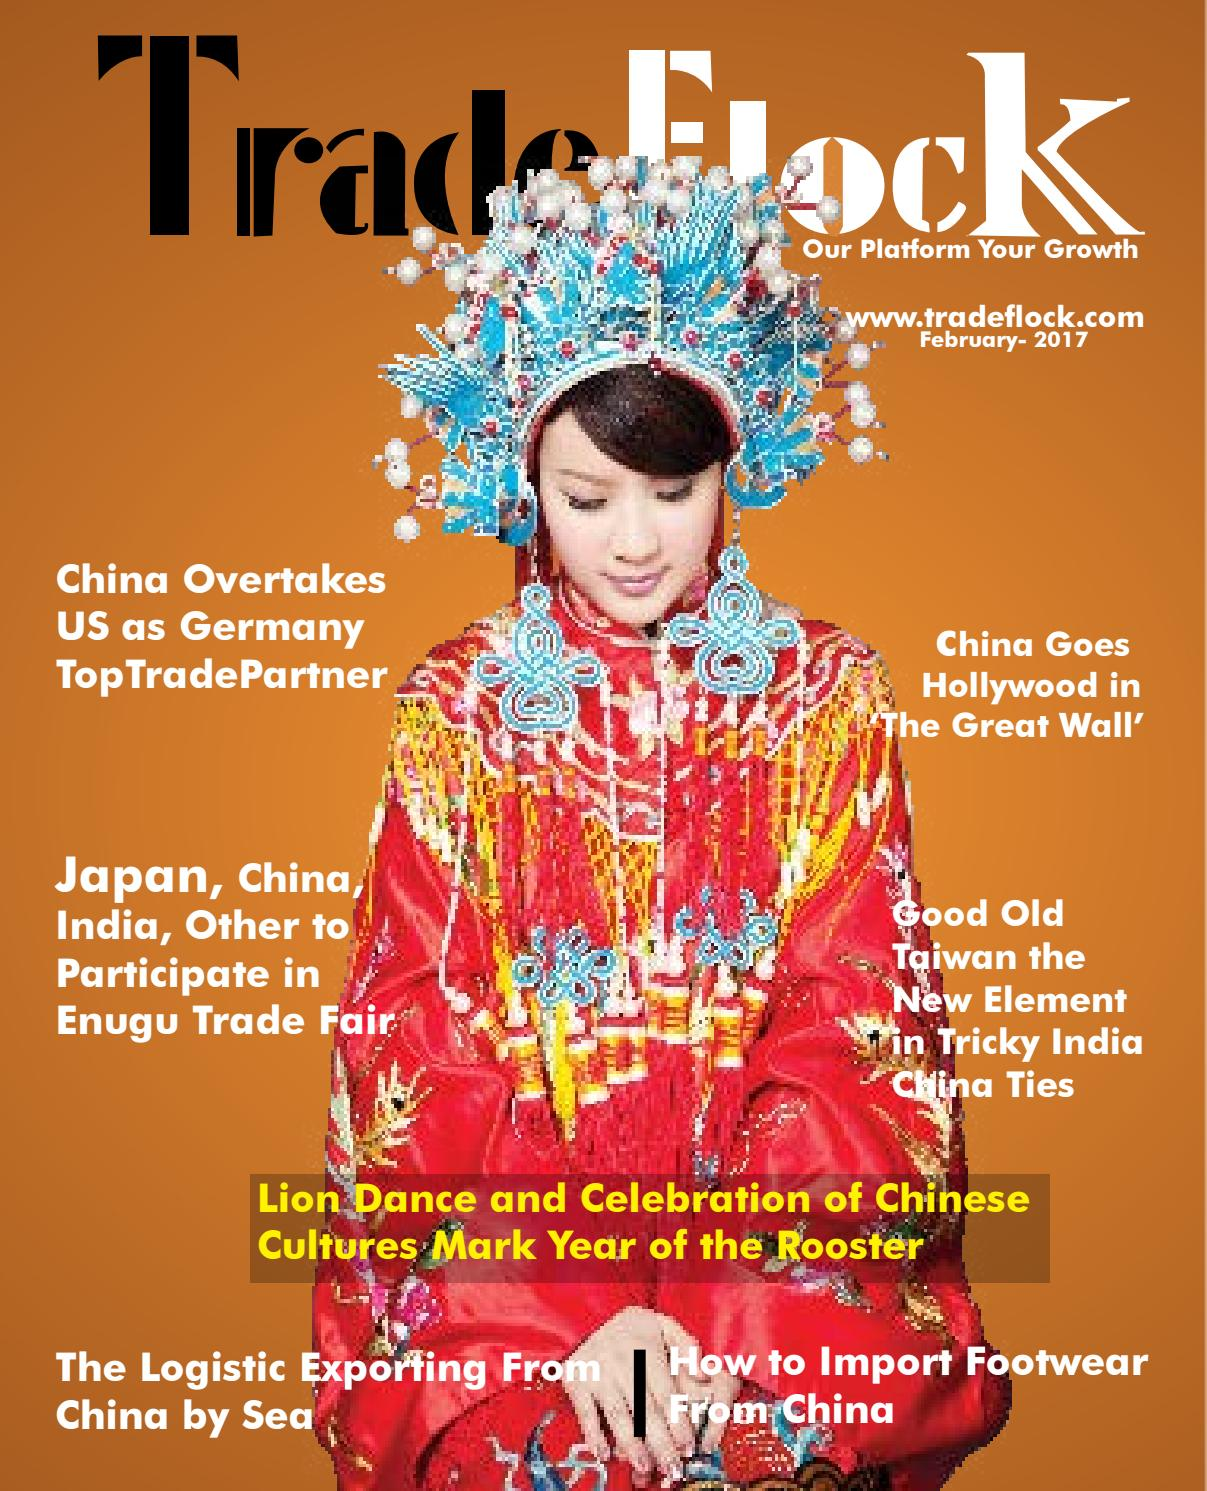 Trade Flock - Feb 2017 by TradeFlock - issuu